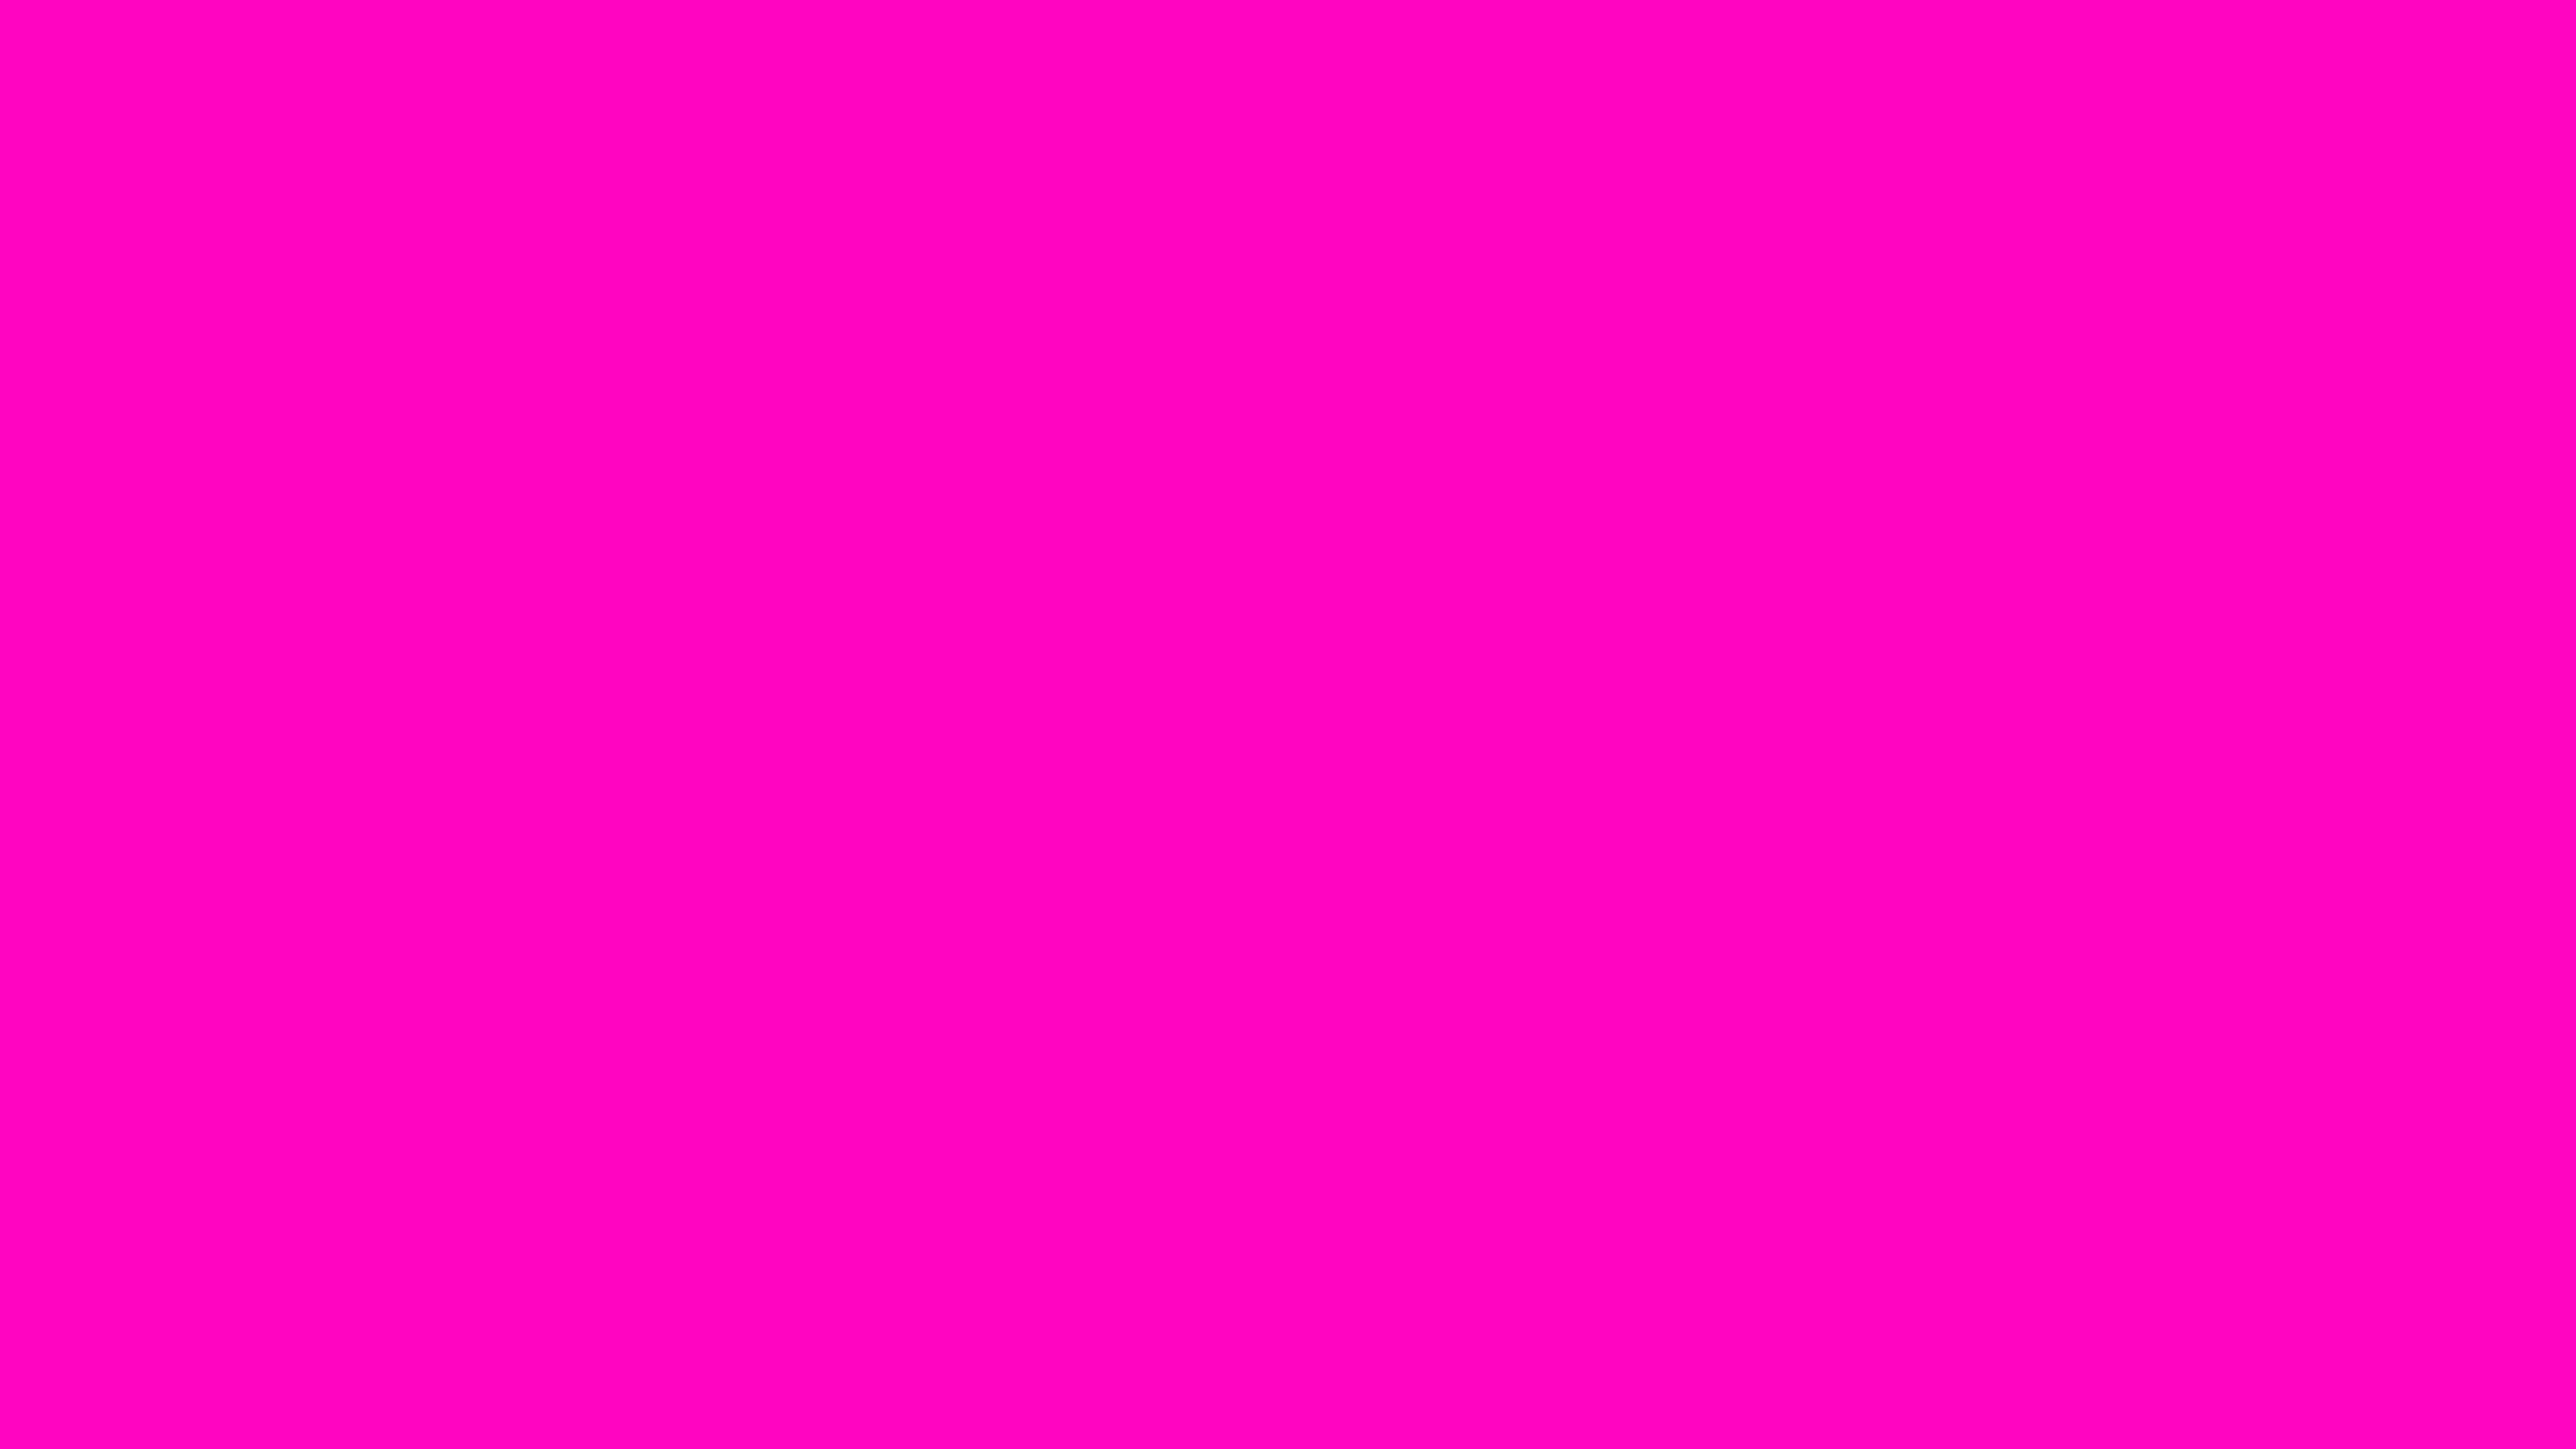 Ff05c1 Solid Color Image Background Hd Desktop And Mobile